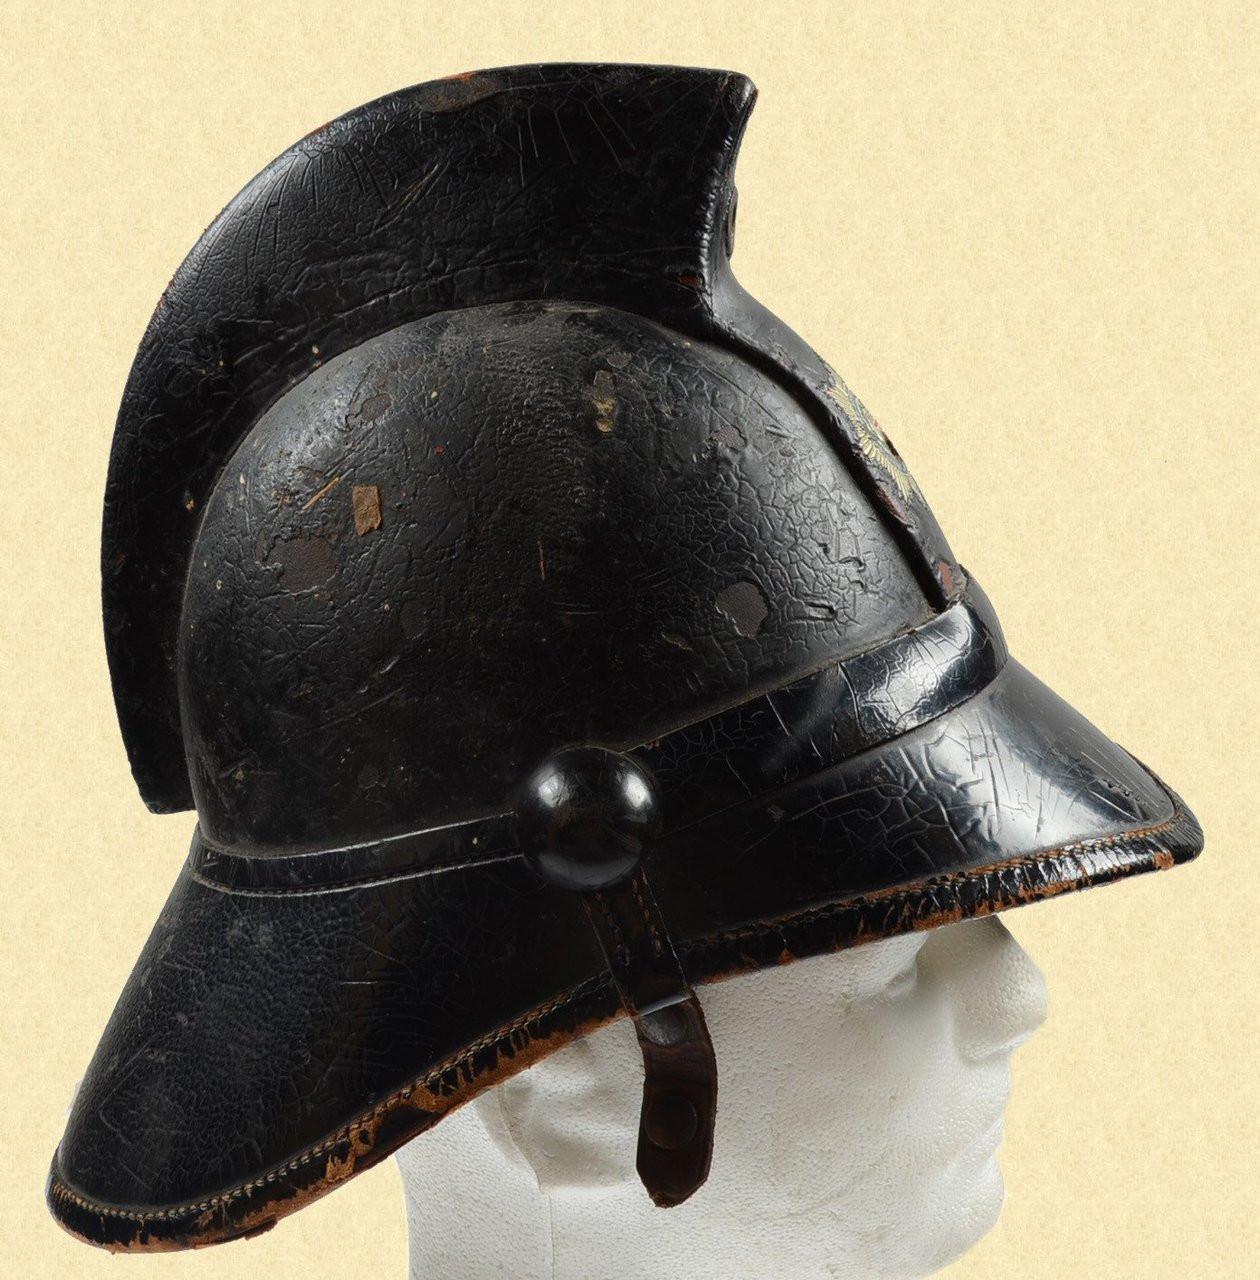 BRITISH LEATHER FIRE HELMET - C19015